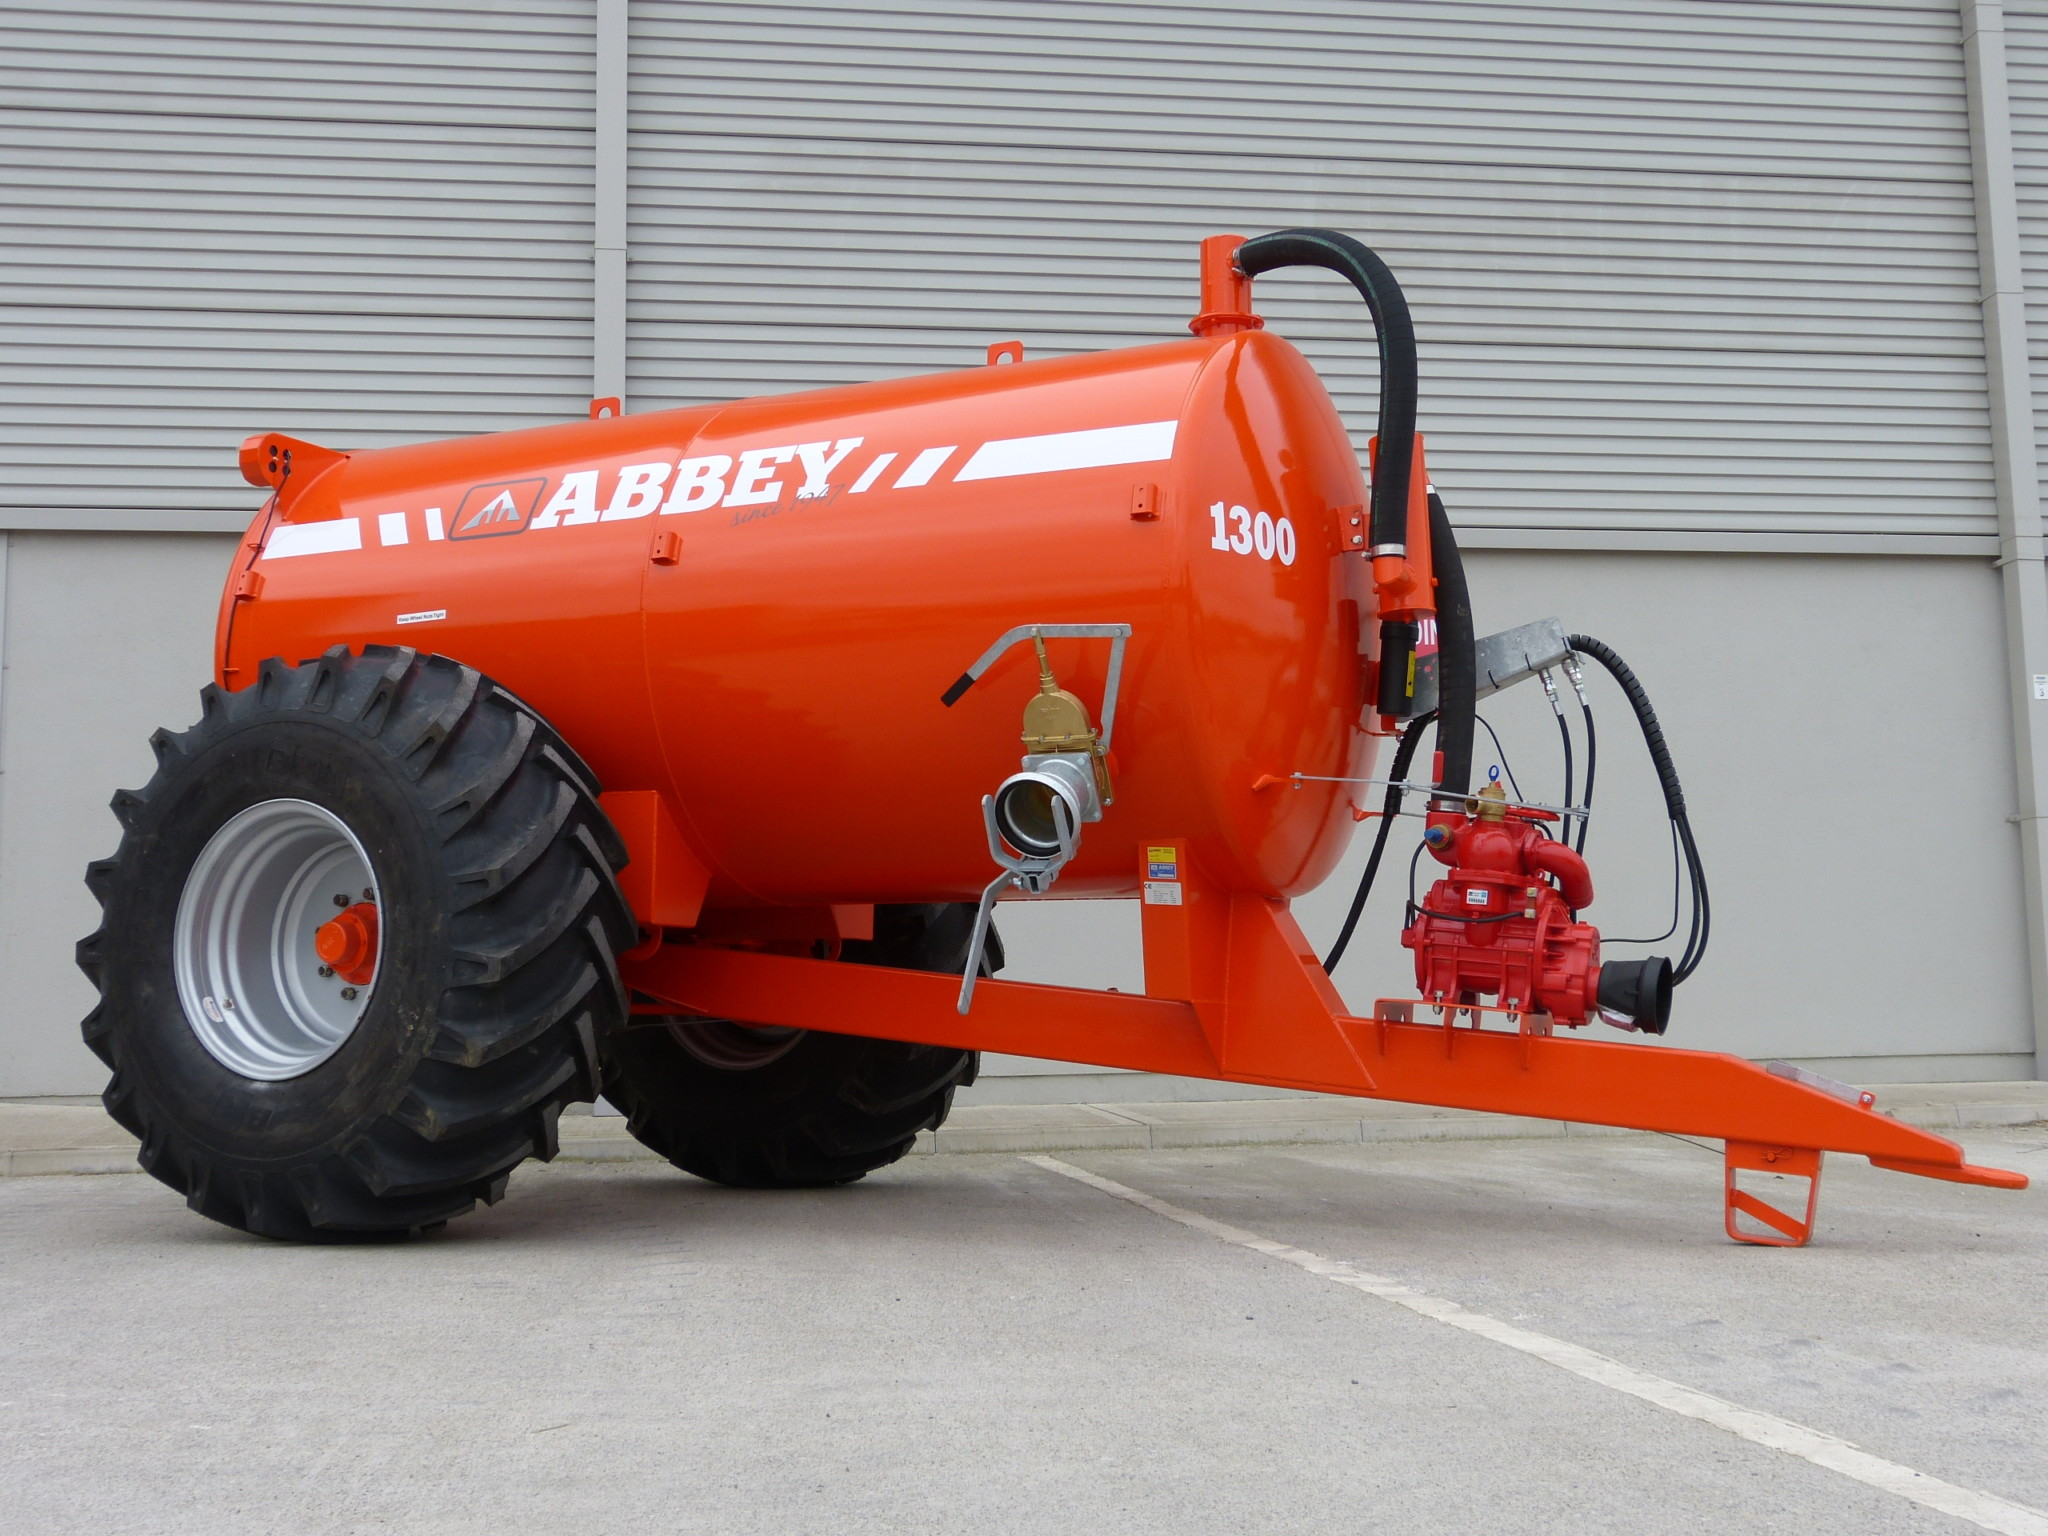 Abbey Slurry tanker Range